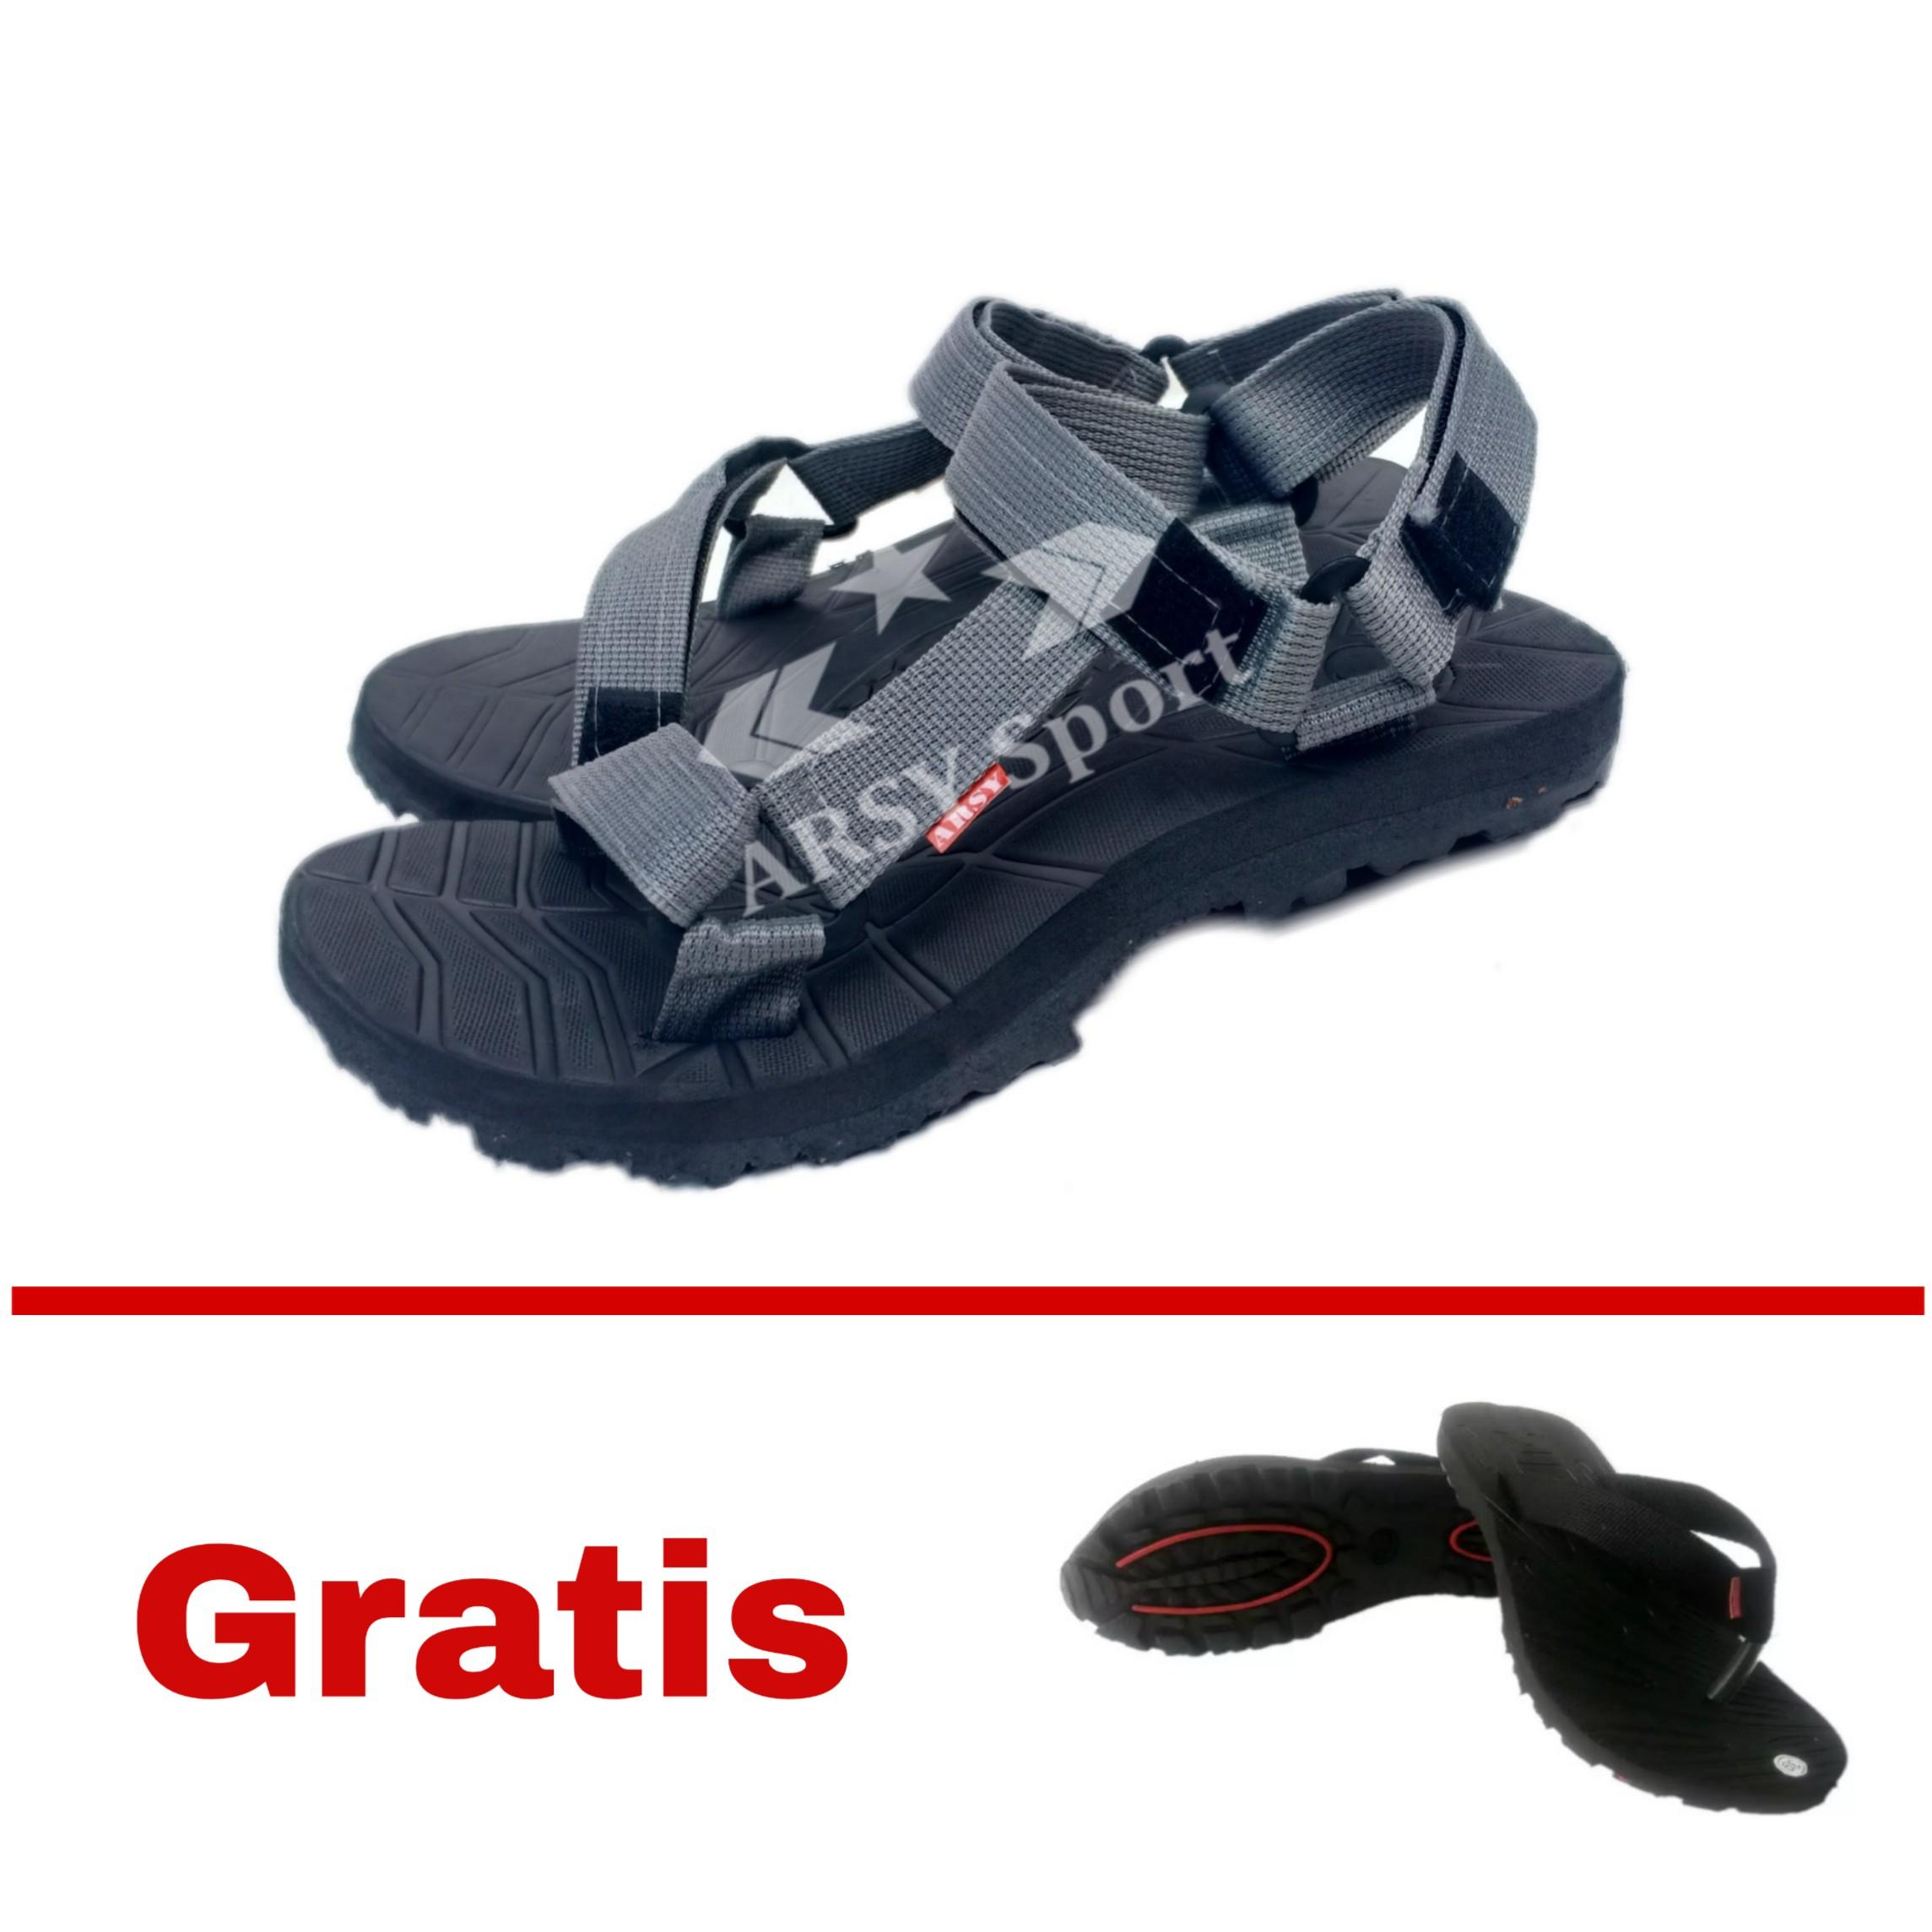 Arsy Sport / Sandal Gunung Anak / Sandal Gunung / Sandal Baby / Sandal Anak Size 21-37 | Lazada Indonesia